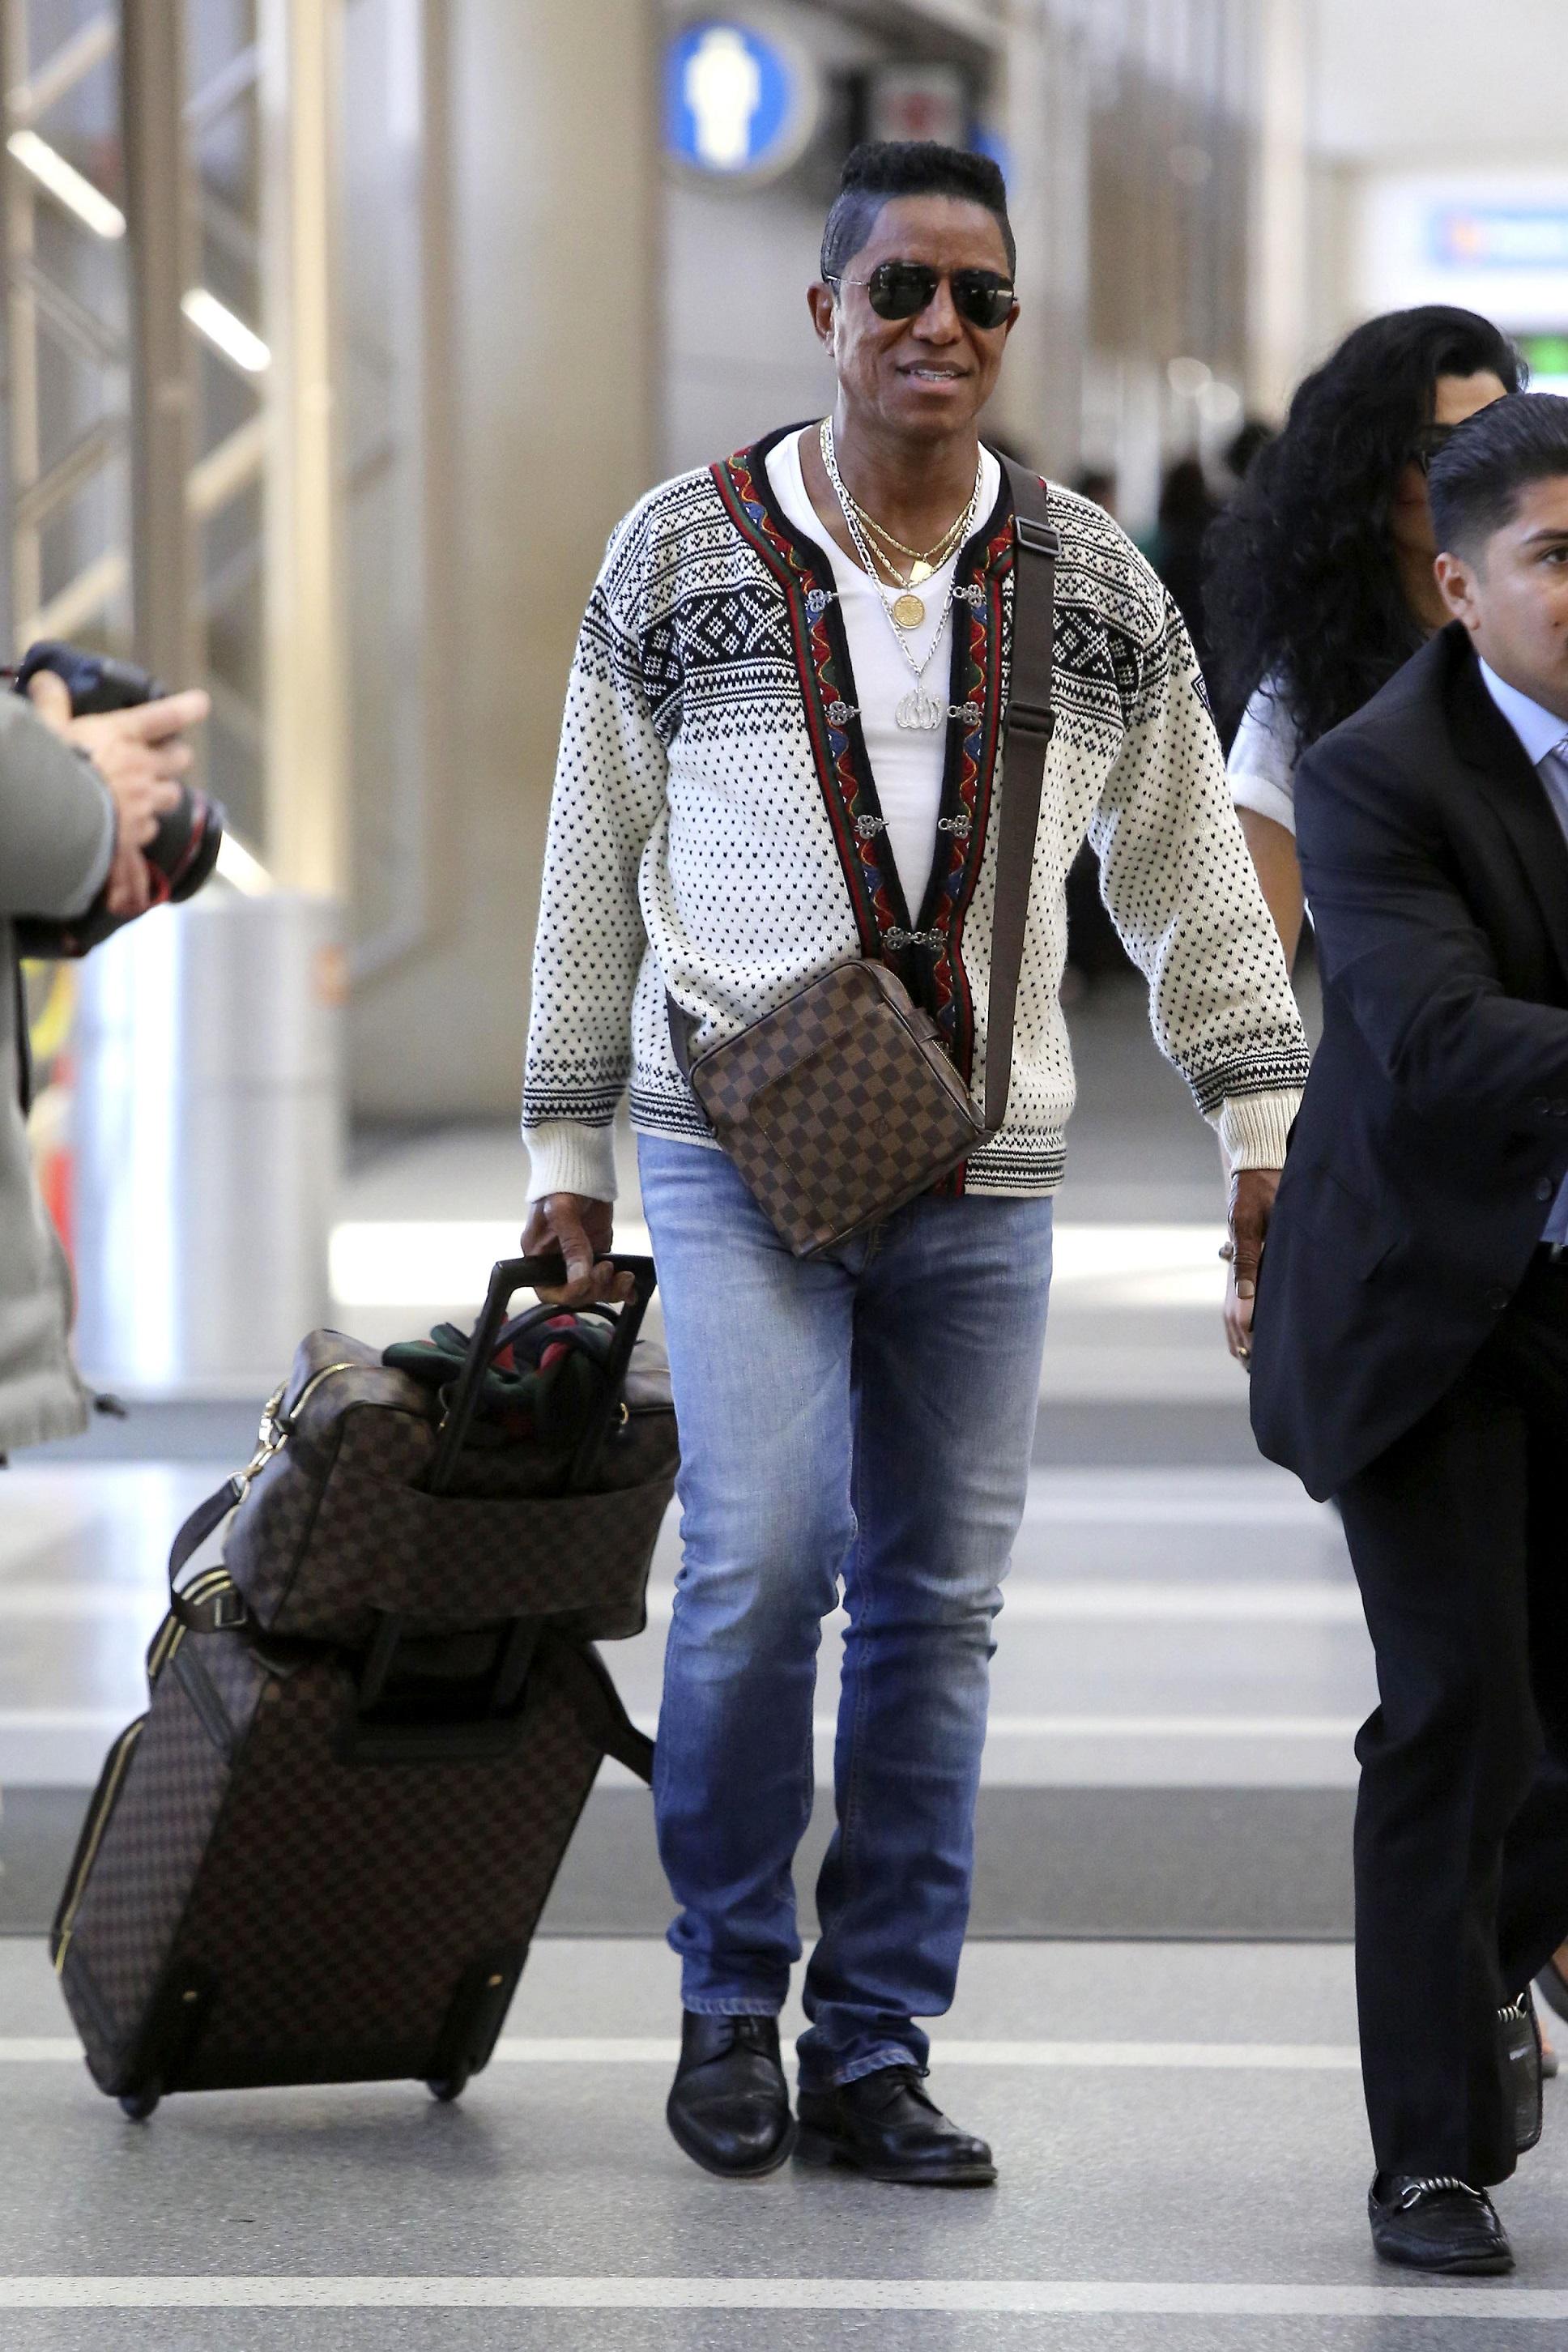 Jermaine Jackson and Halima plan on safe travels Jermaine Jackson